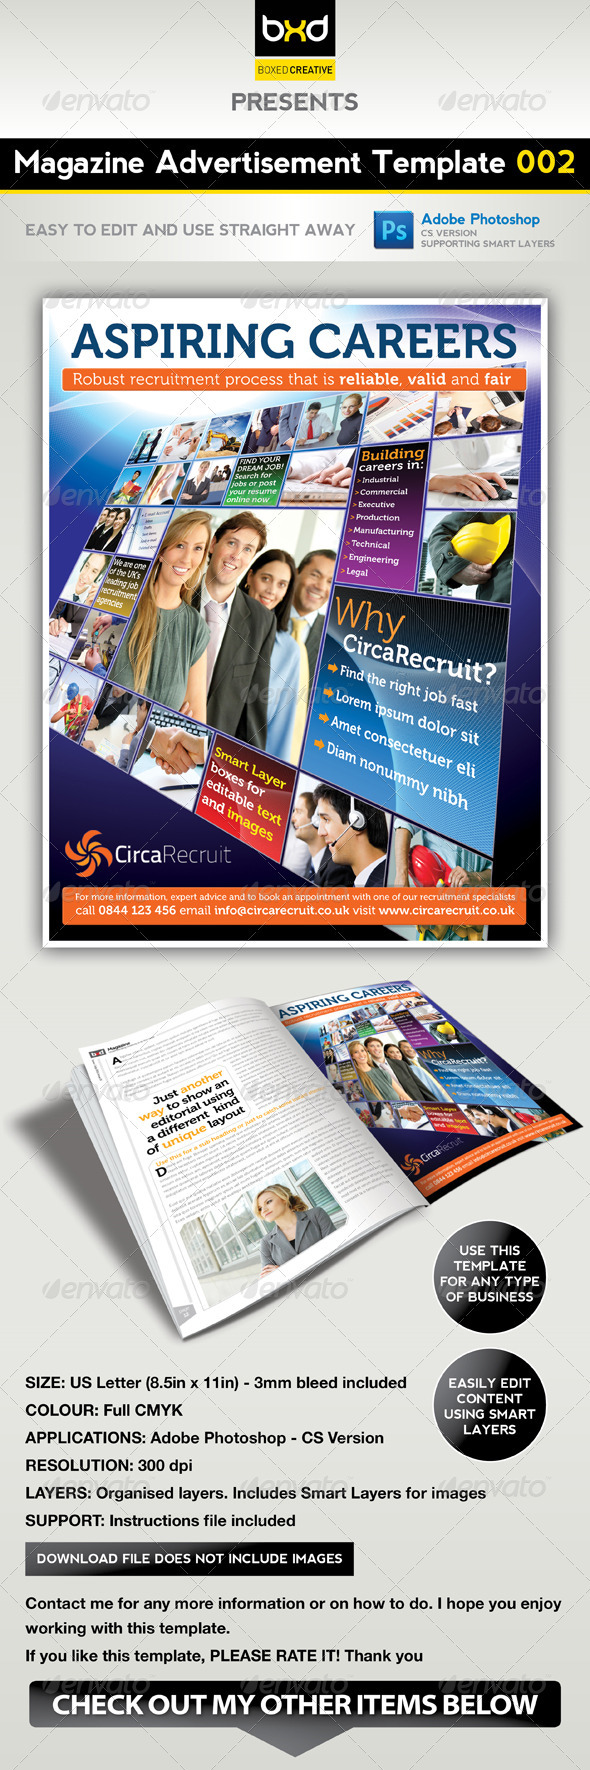 Magazine Advert Template 002 - Corporate Flyers